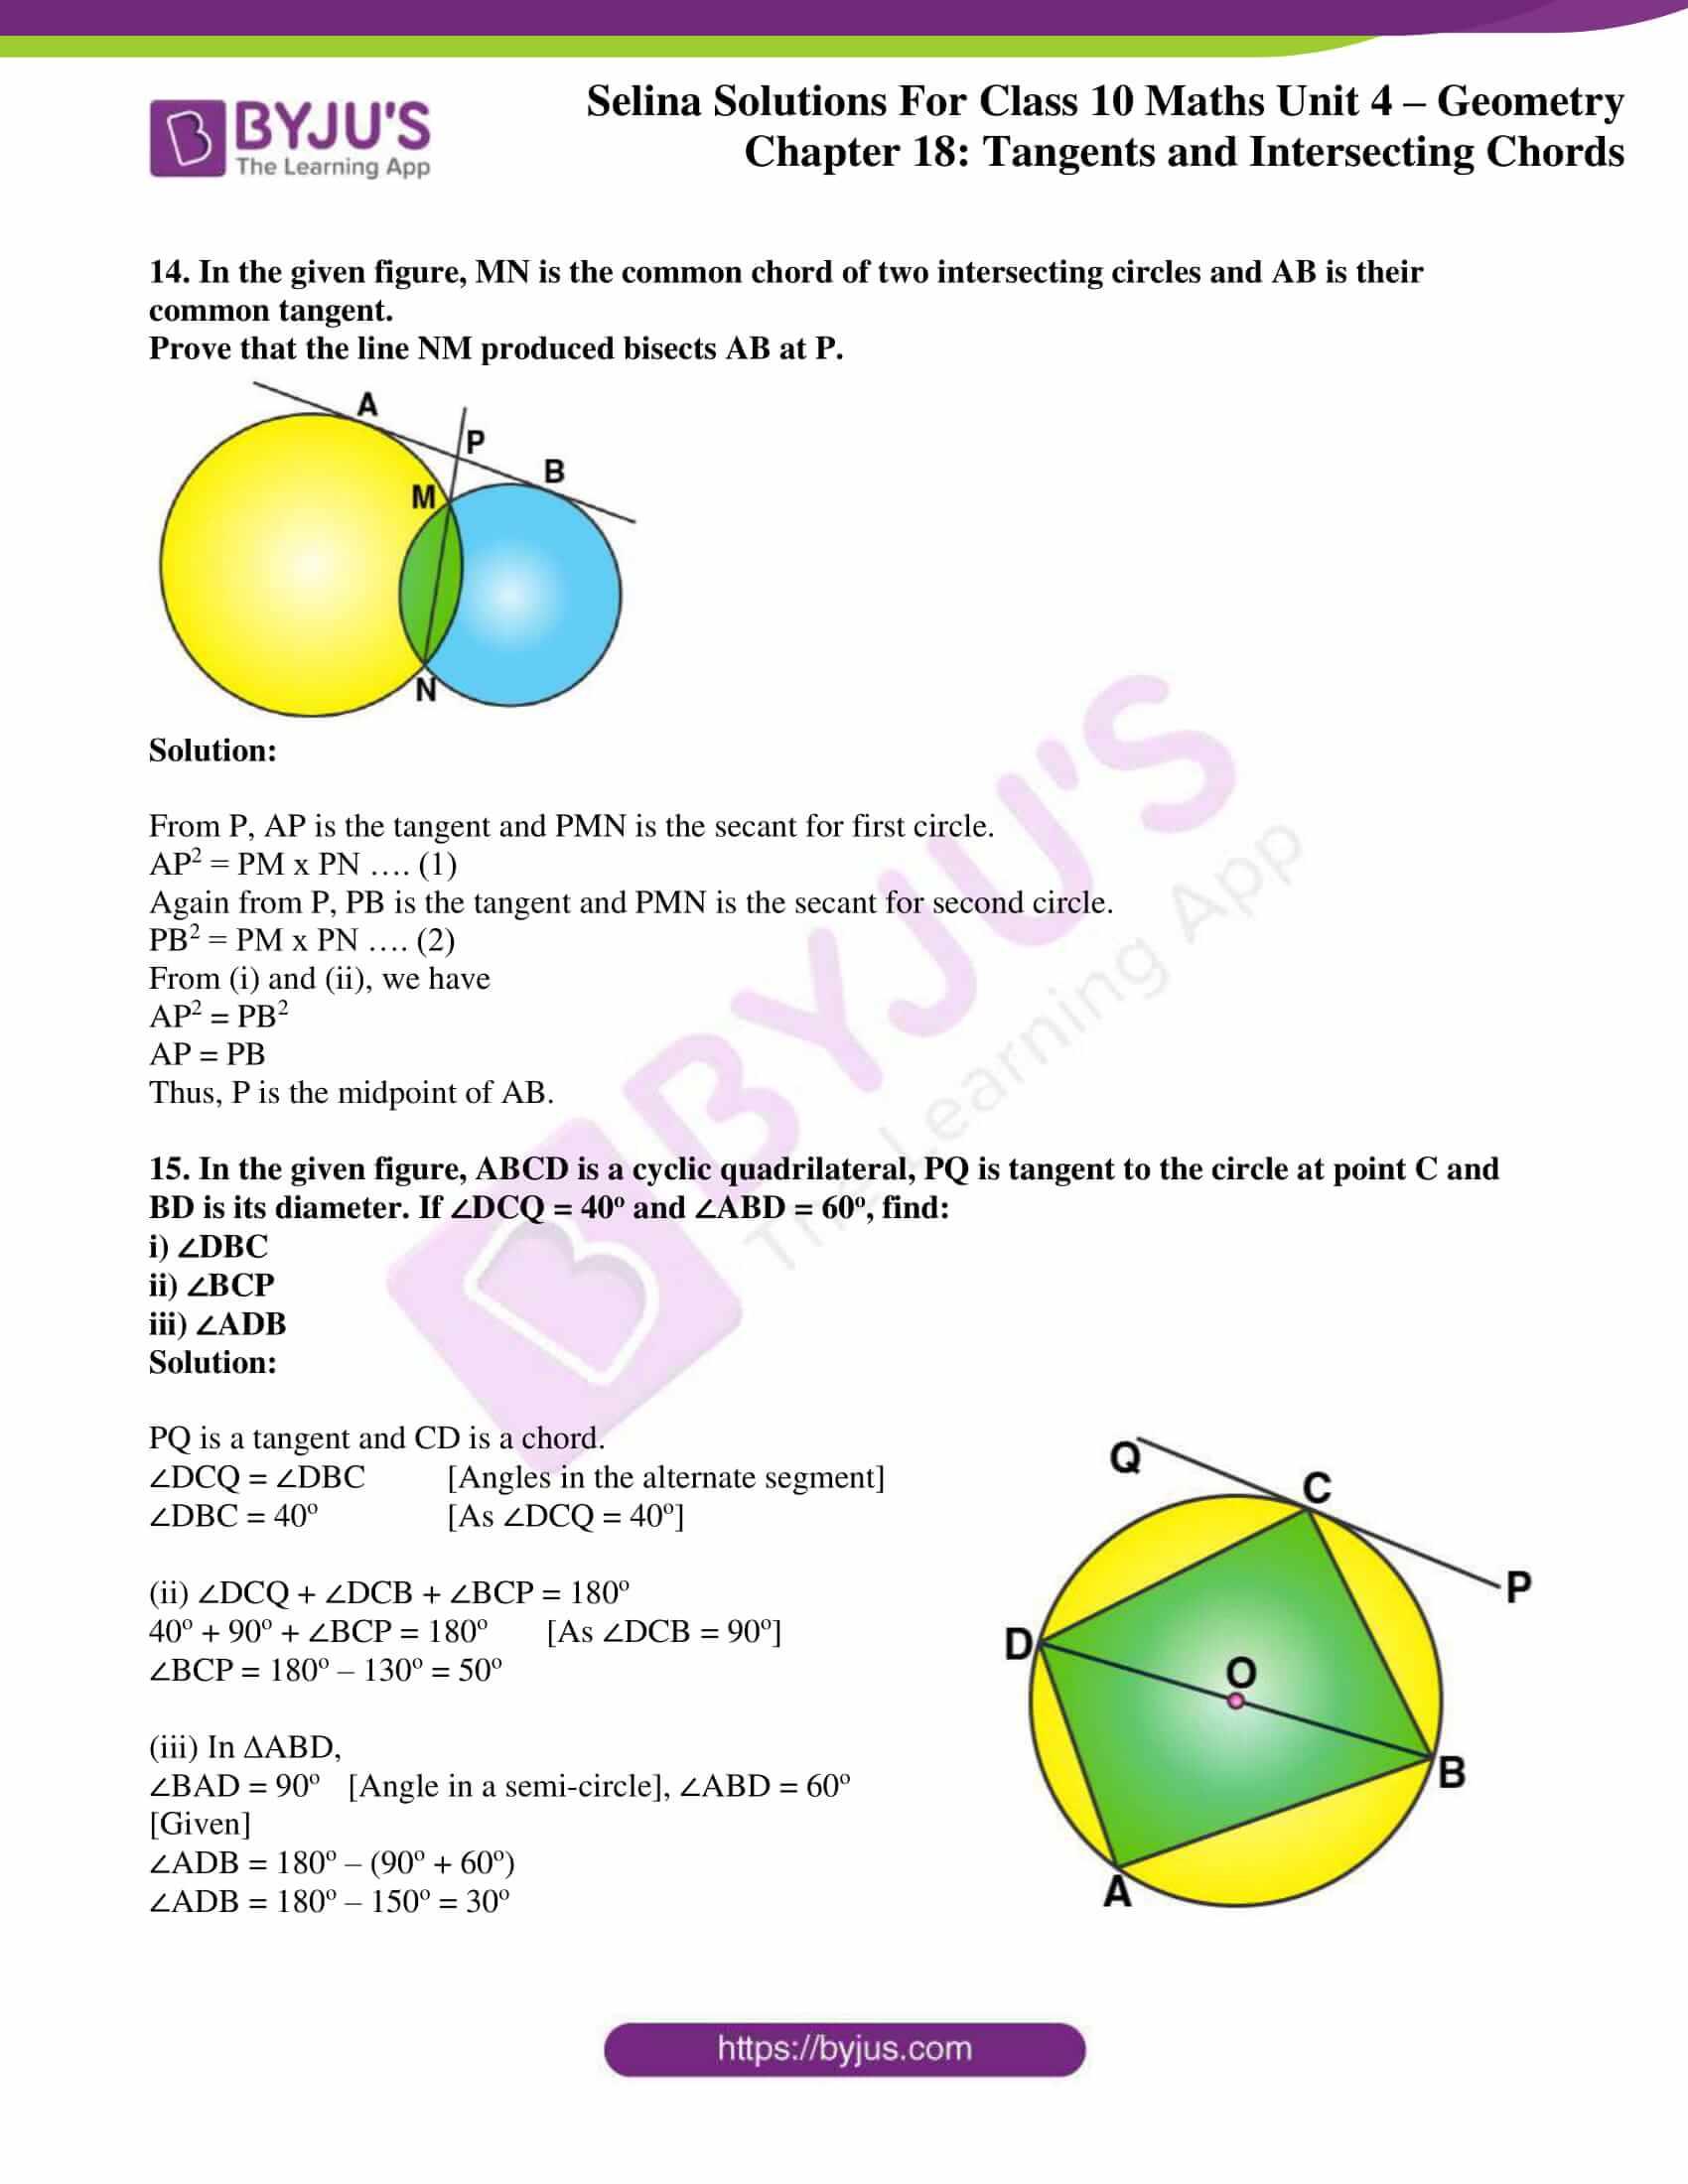 selina-sol-maths-class-10-ch-18-ex-c-08